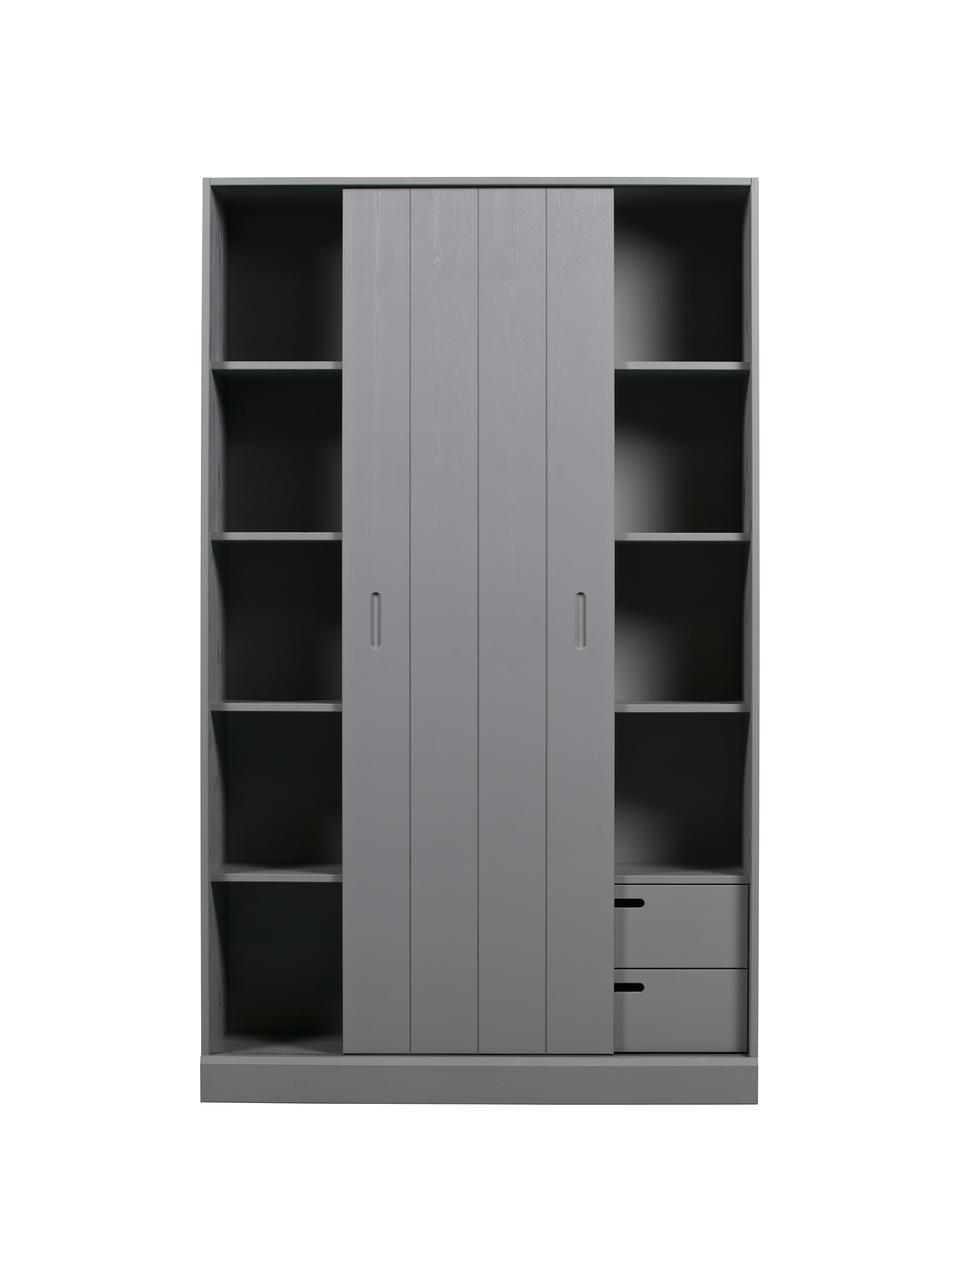 Schrank Move mit 1 Schiebetür in Grau, Kiefernholz, lackiert, Grau, 120 x 200 cm